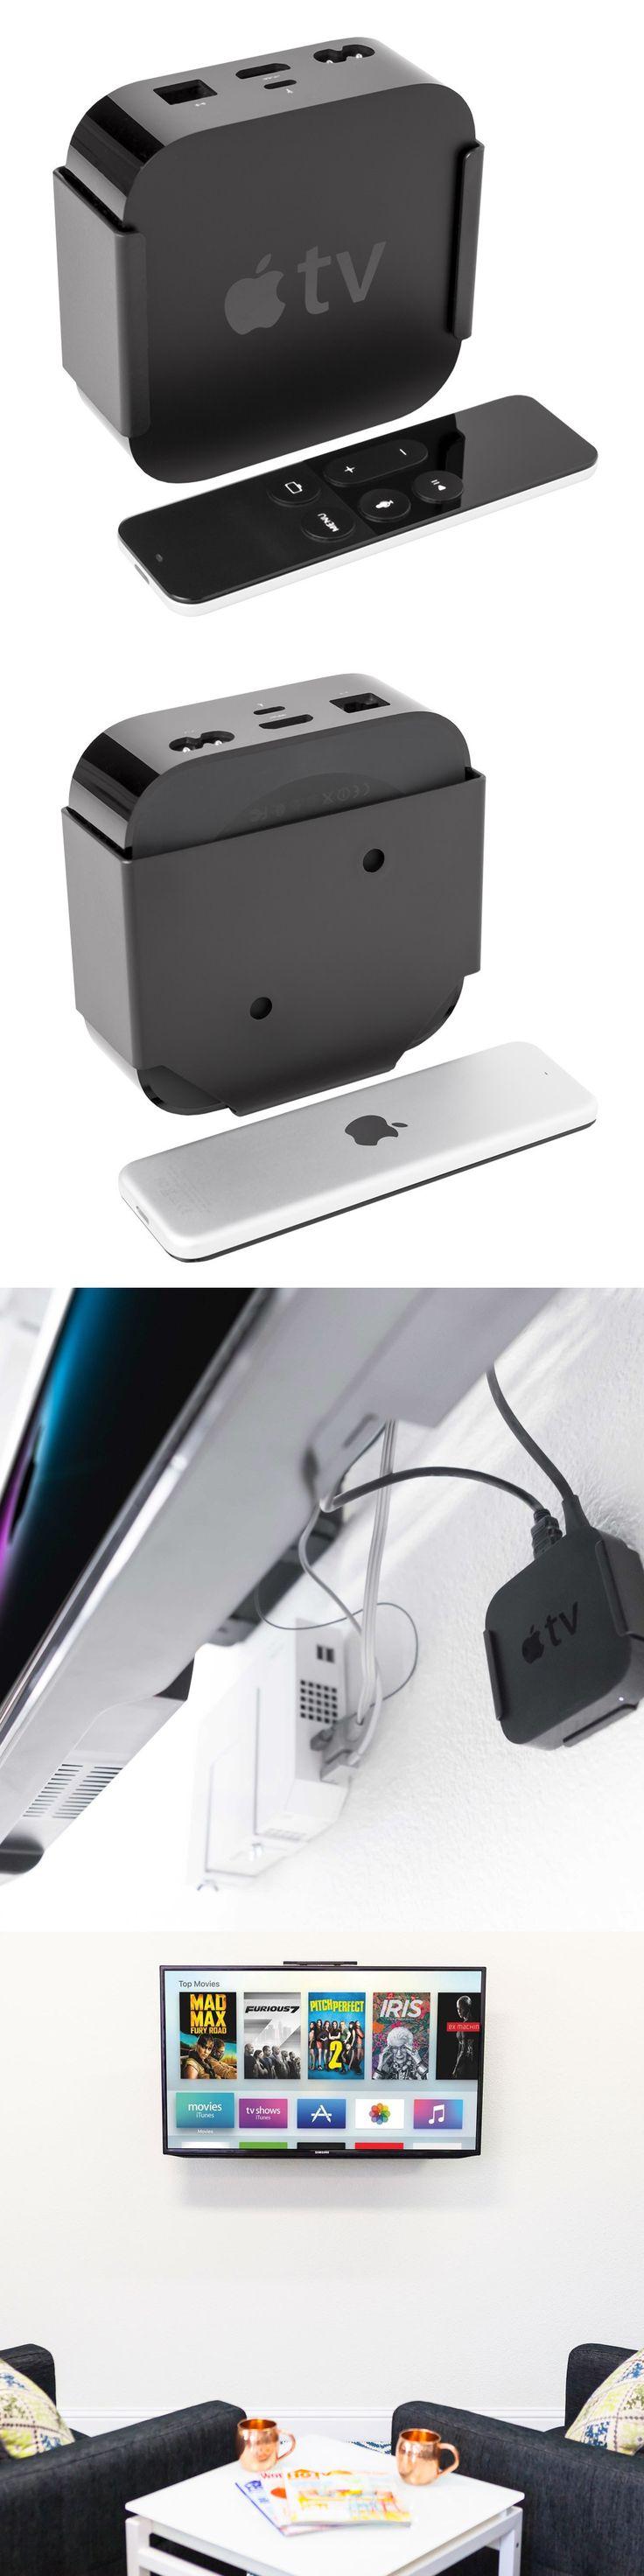 Apple® TV 4th Gen Wall Mount www.handyman-goldcoast.com